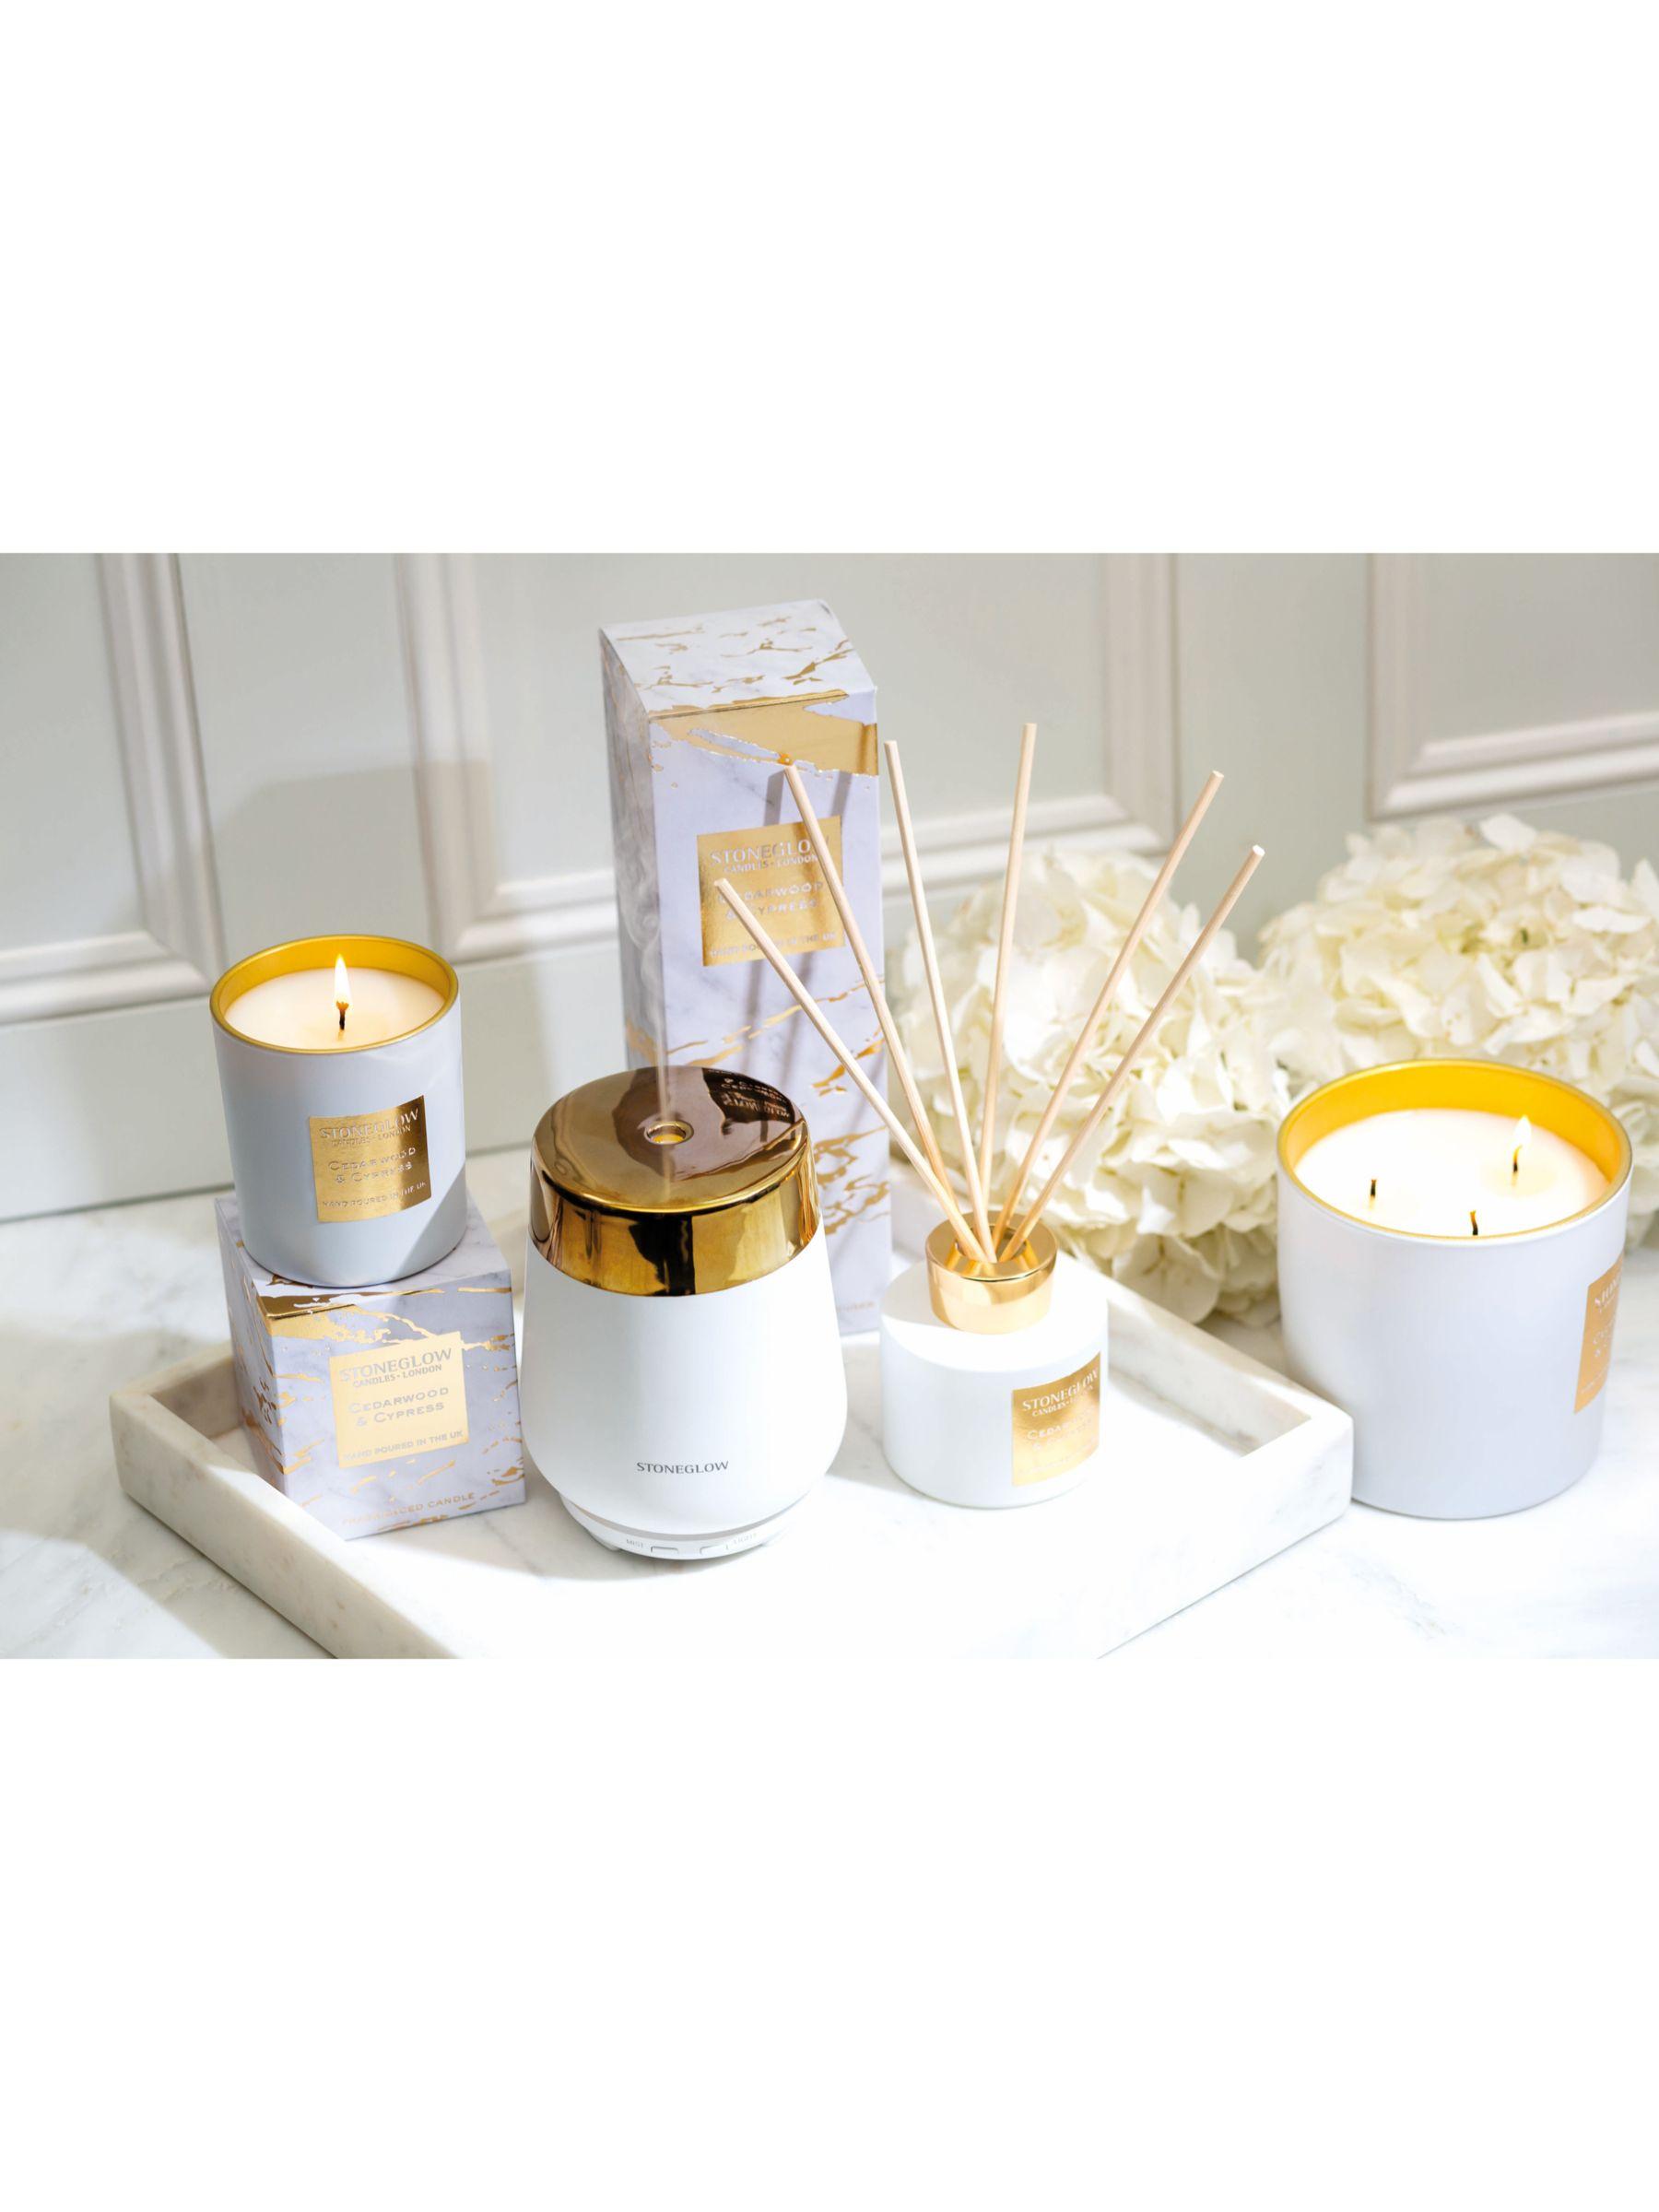 Stoneglow Stoneglow Luna Cedarwood & Cypress Scented Candle, 220g